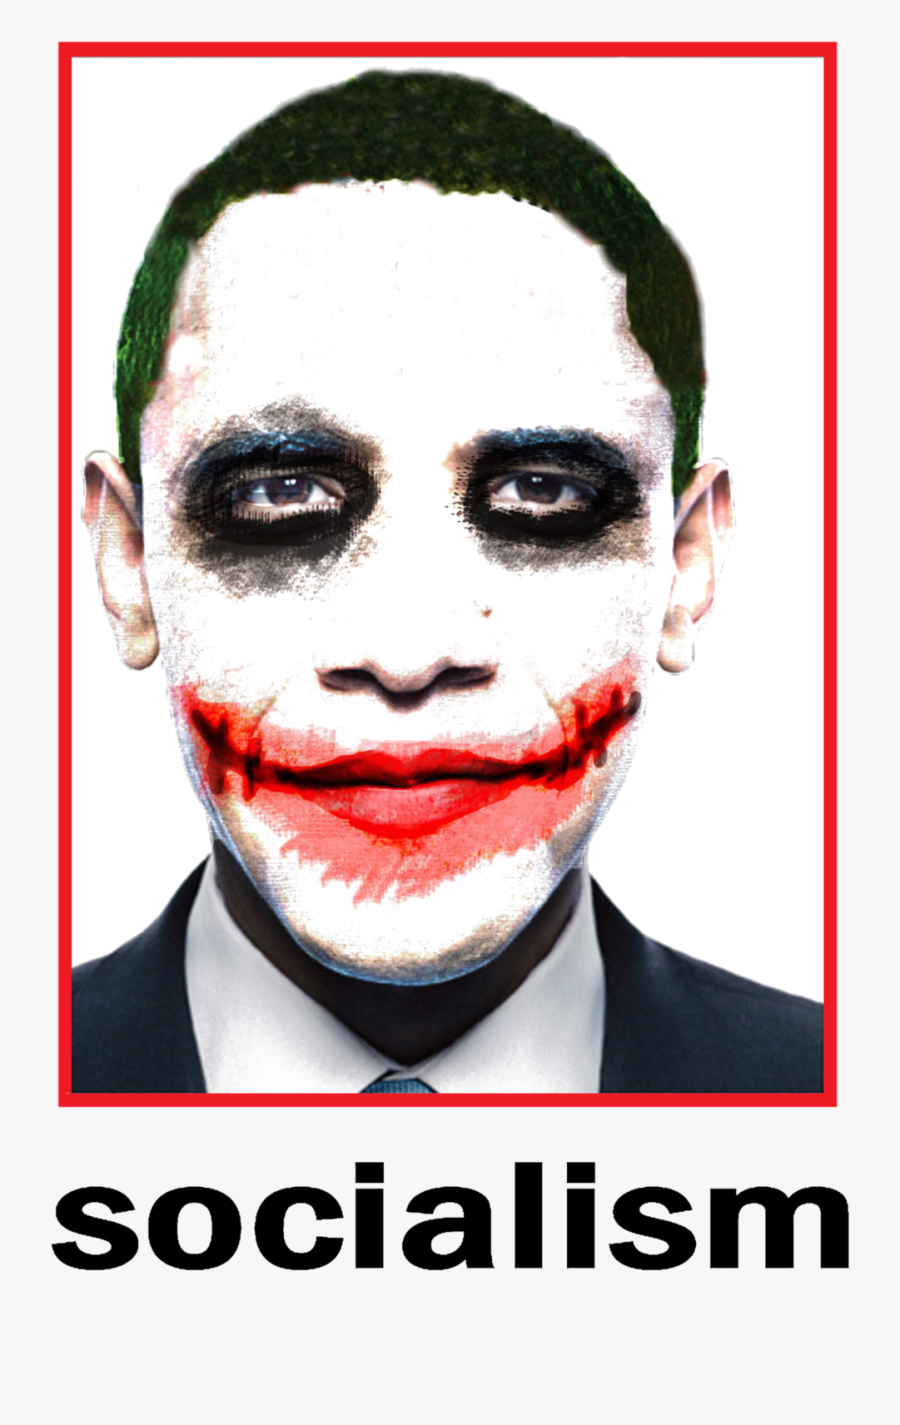 Bruce Lee Art Barack Obama Gif On Gifer By Vizil Clipart - Time Magazine Obama Cover, Transparent Clipart